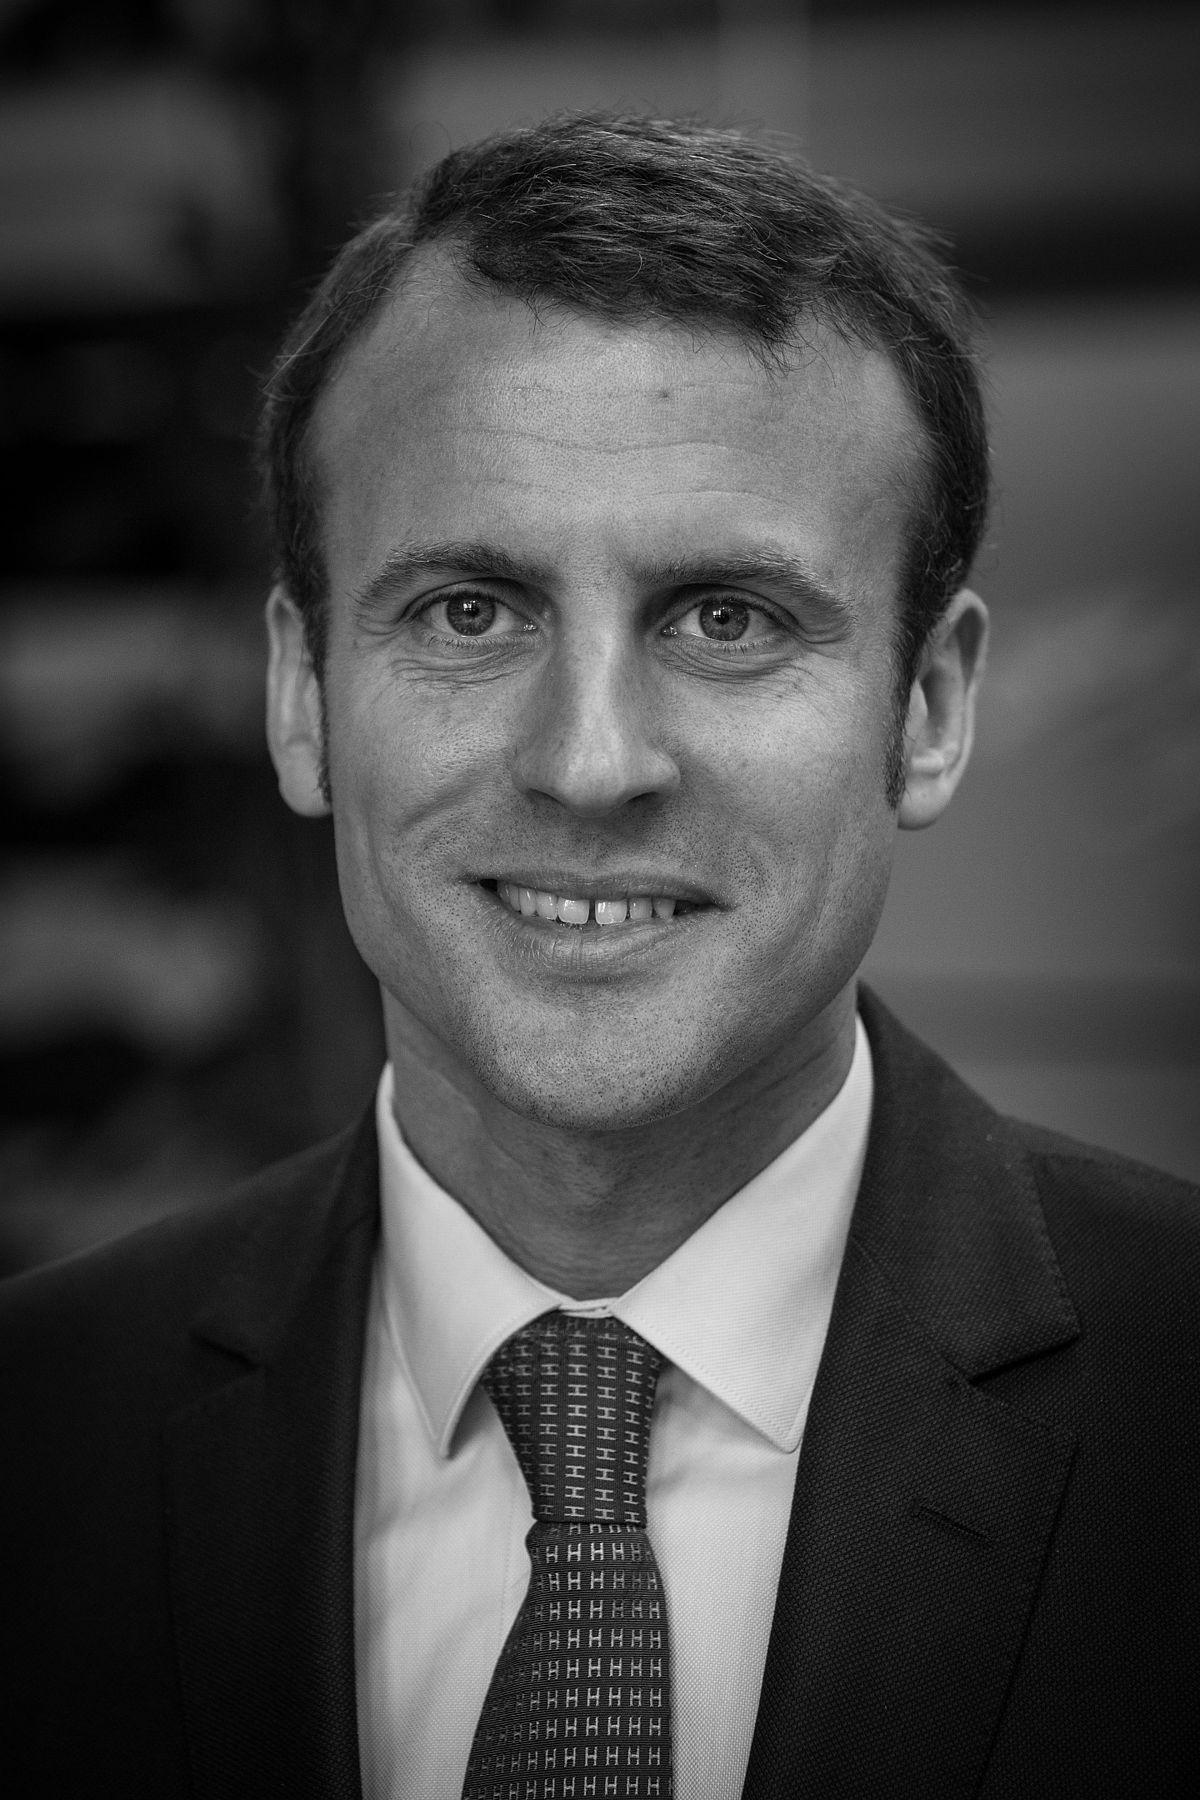 Emmanuel Macron Wikipedia Fotos Youtube E Personalidade